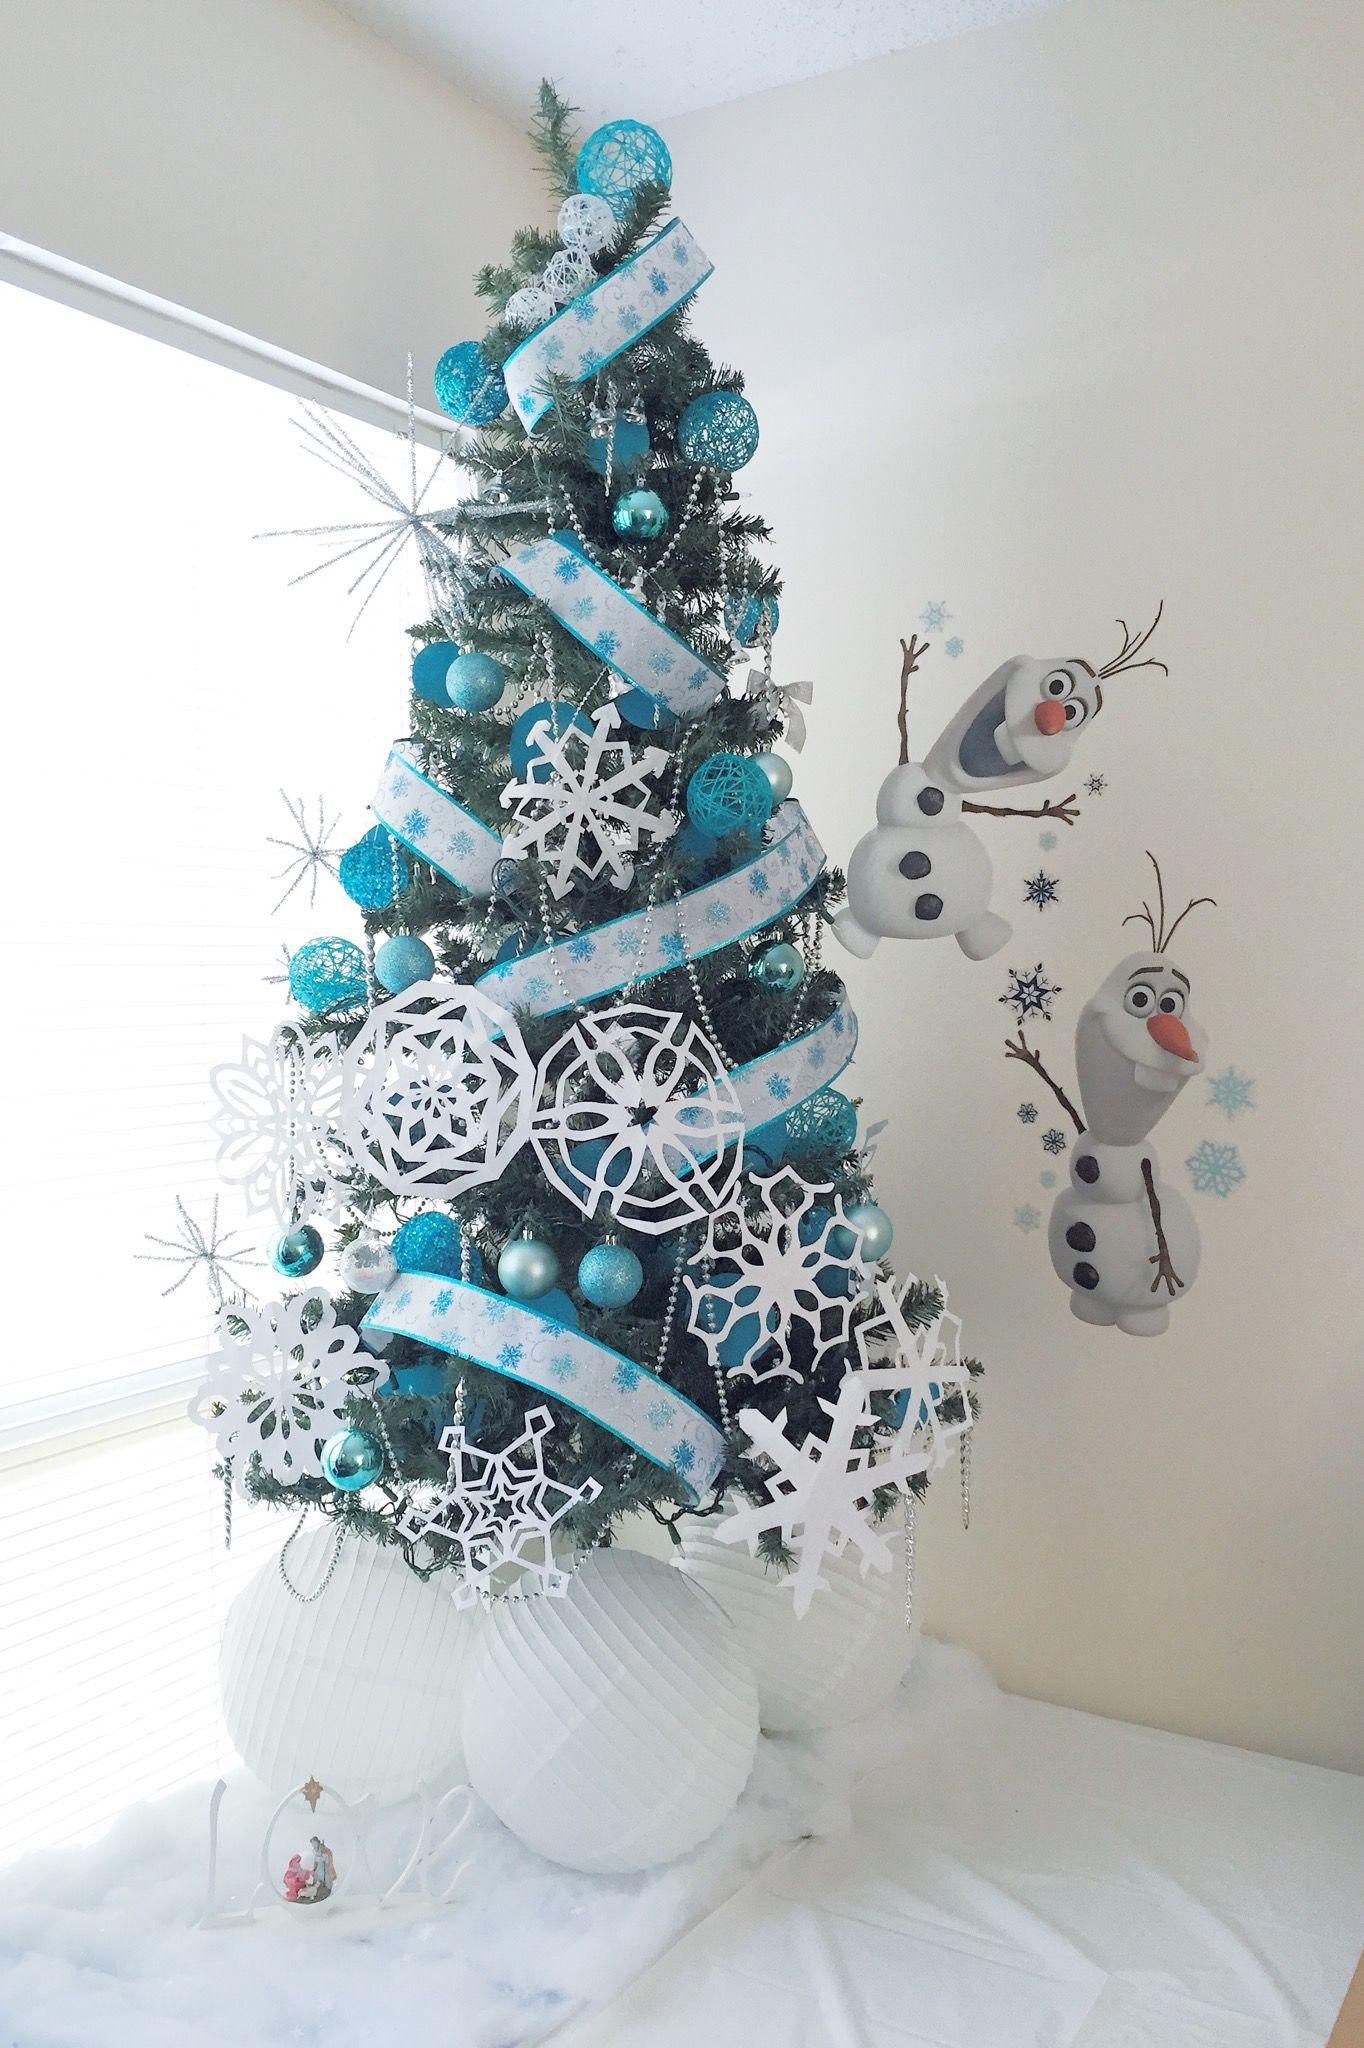 Christmas Frozen Decorations Ideas | Christmas | Pinterest ...